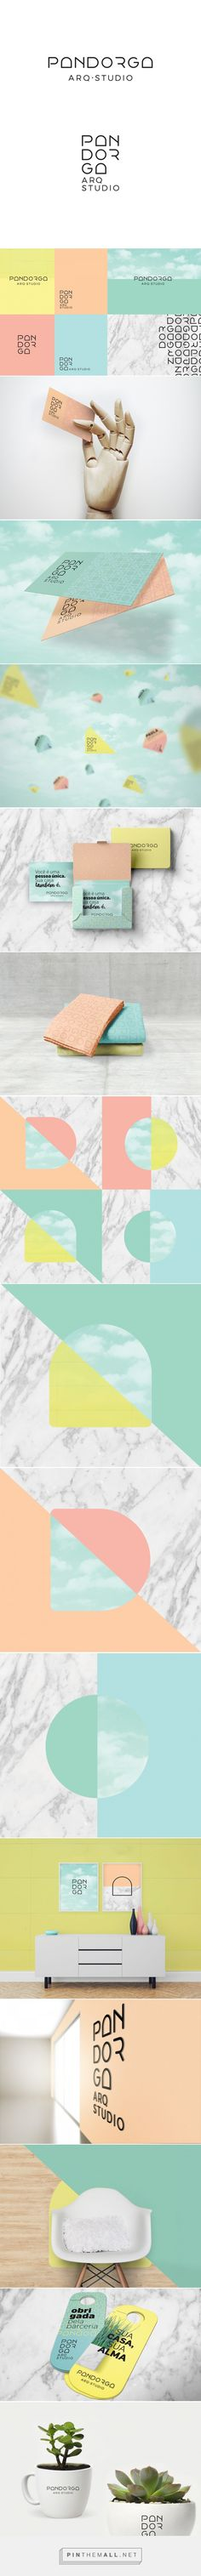 Pandorga Branding on Behance   Fivestar Branding – Design and Branding Agency & Inspiration Gallery